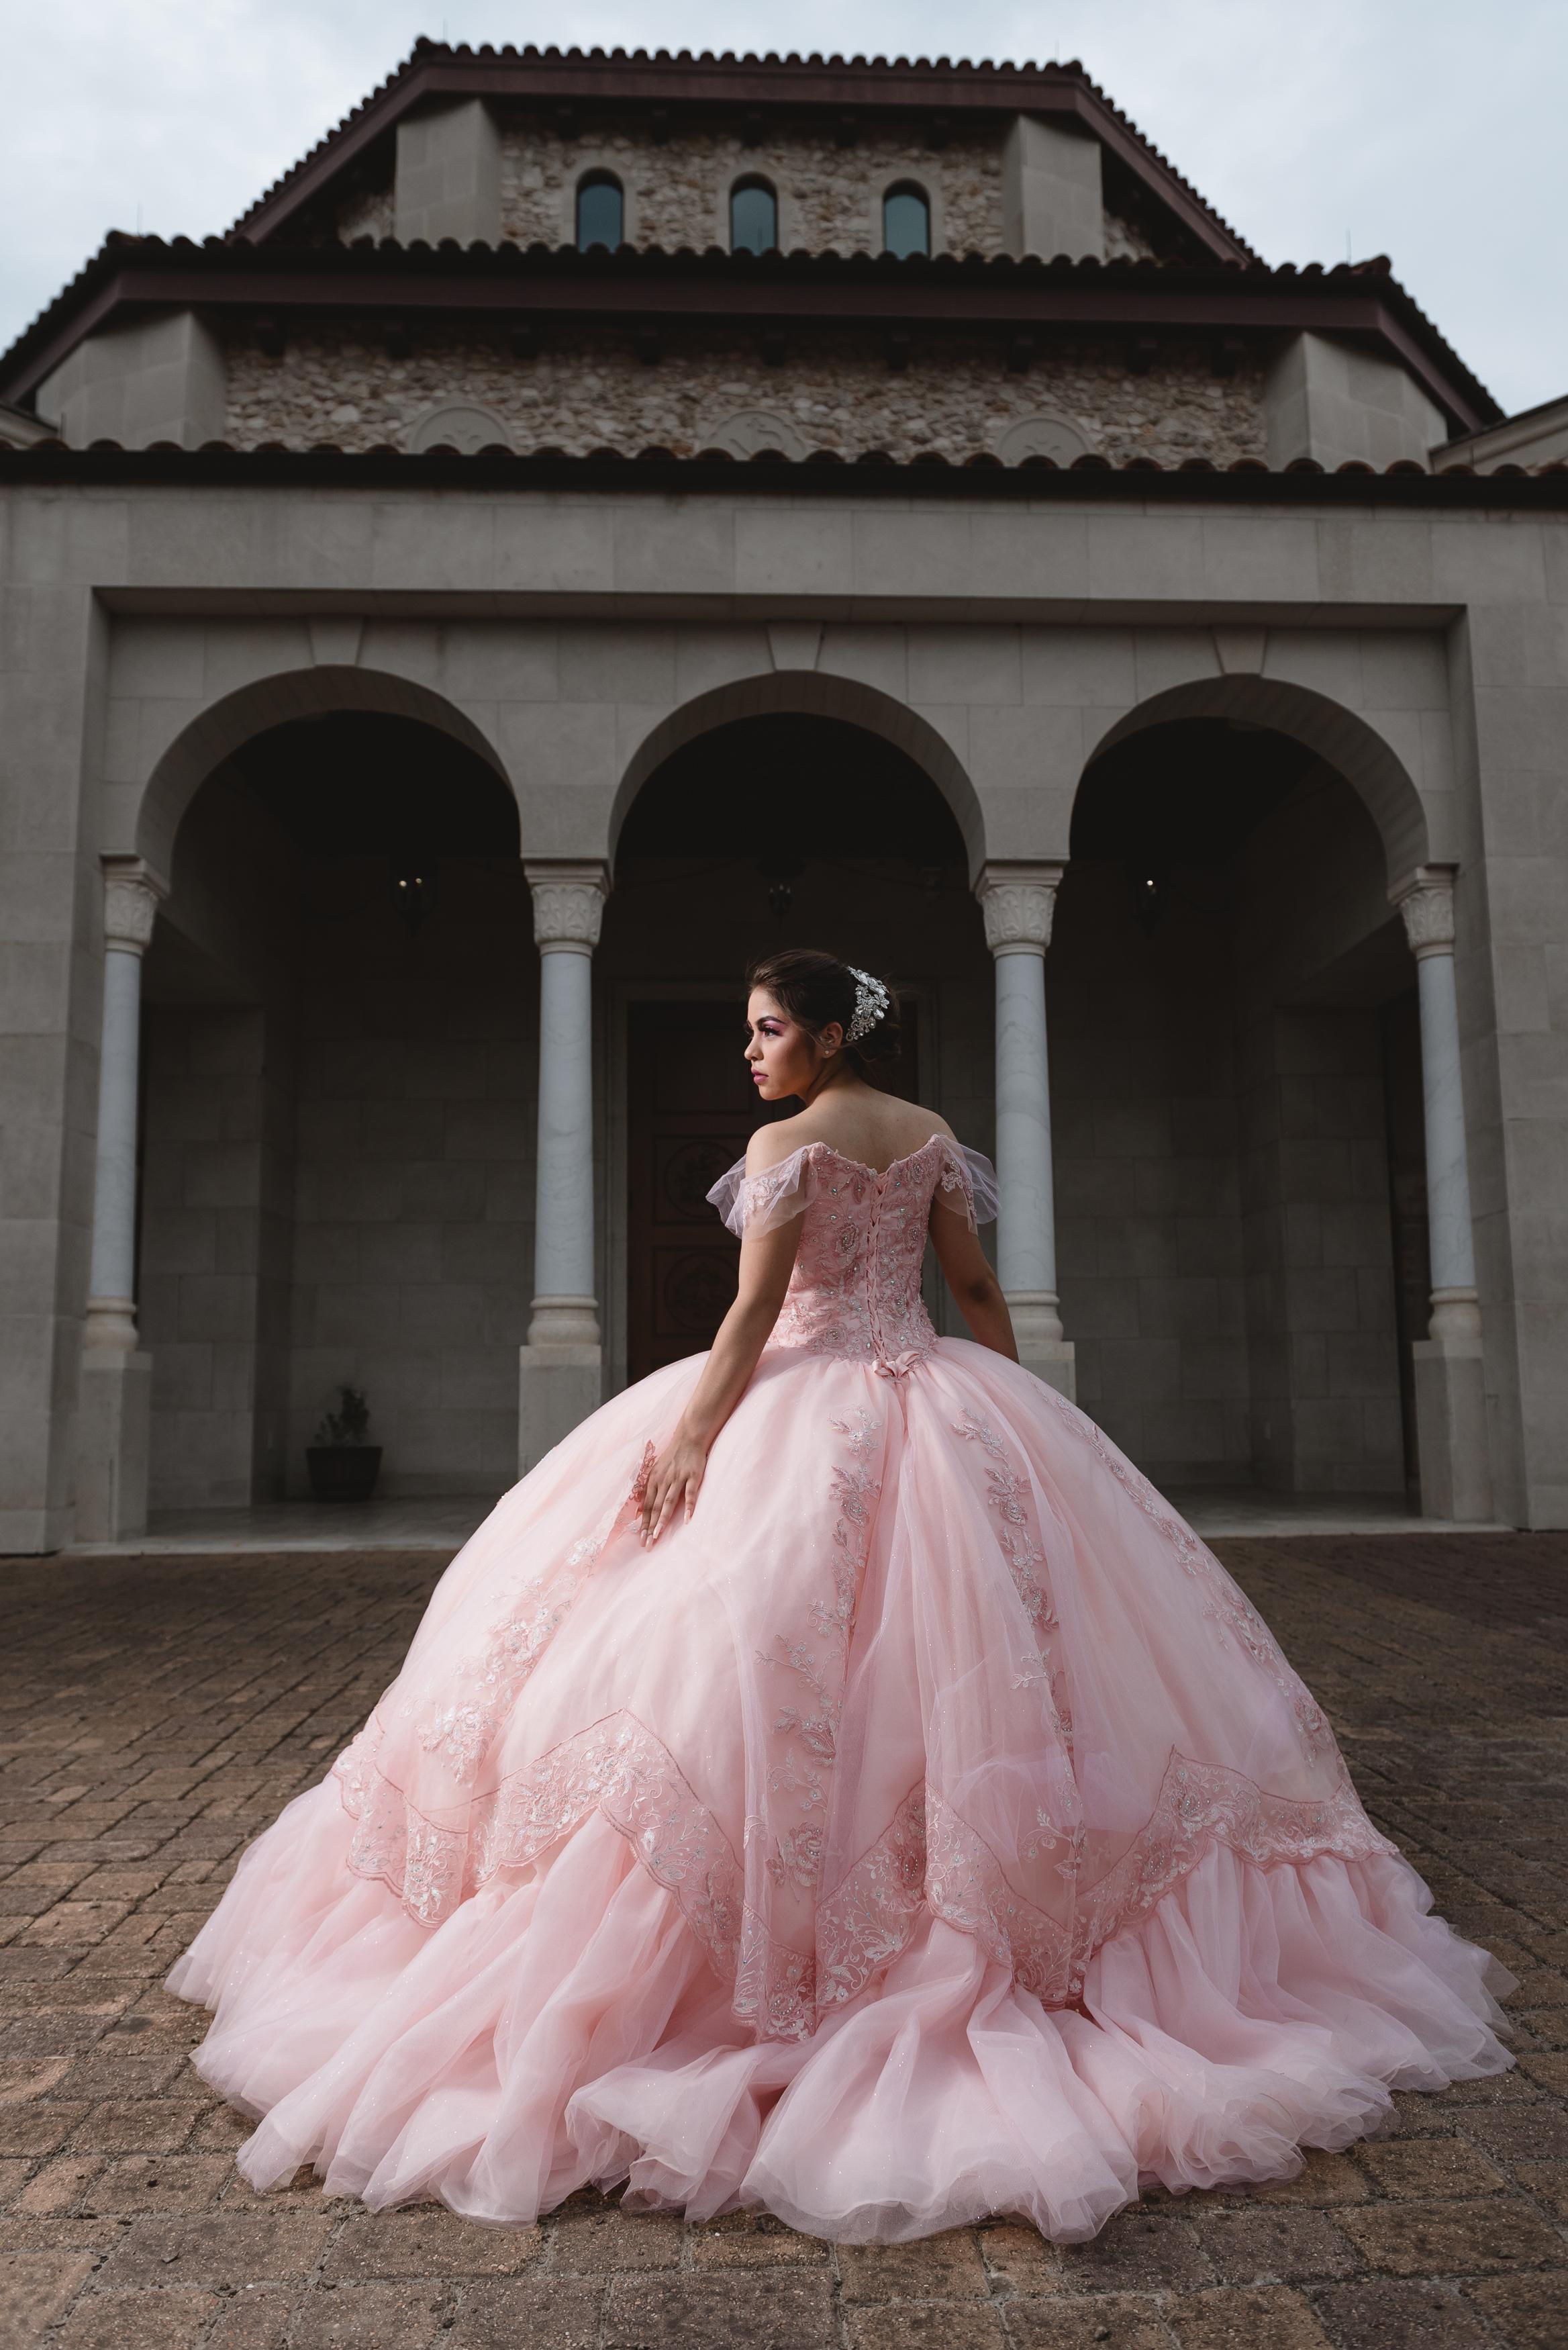 luxury modern fun houston wedding quince sweet fun adventurous elopement 16 batmitzvah mar mitvahquinceanera best photographer katy texas engagement